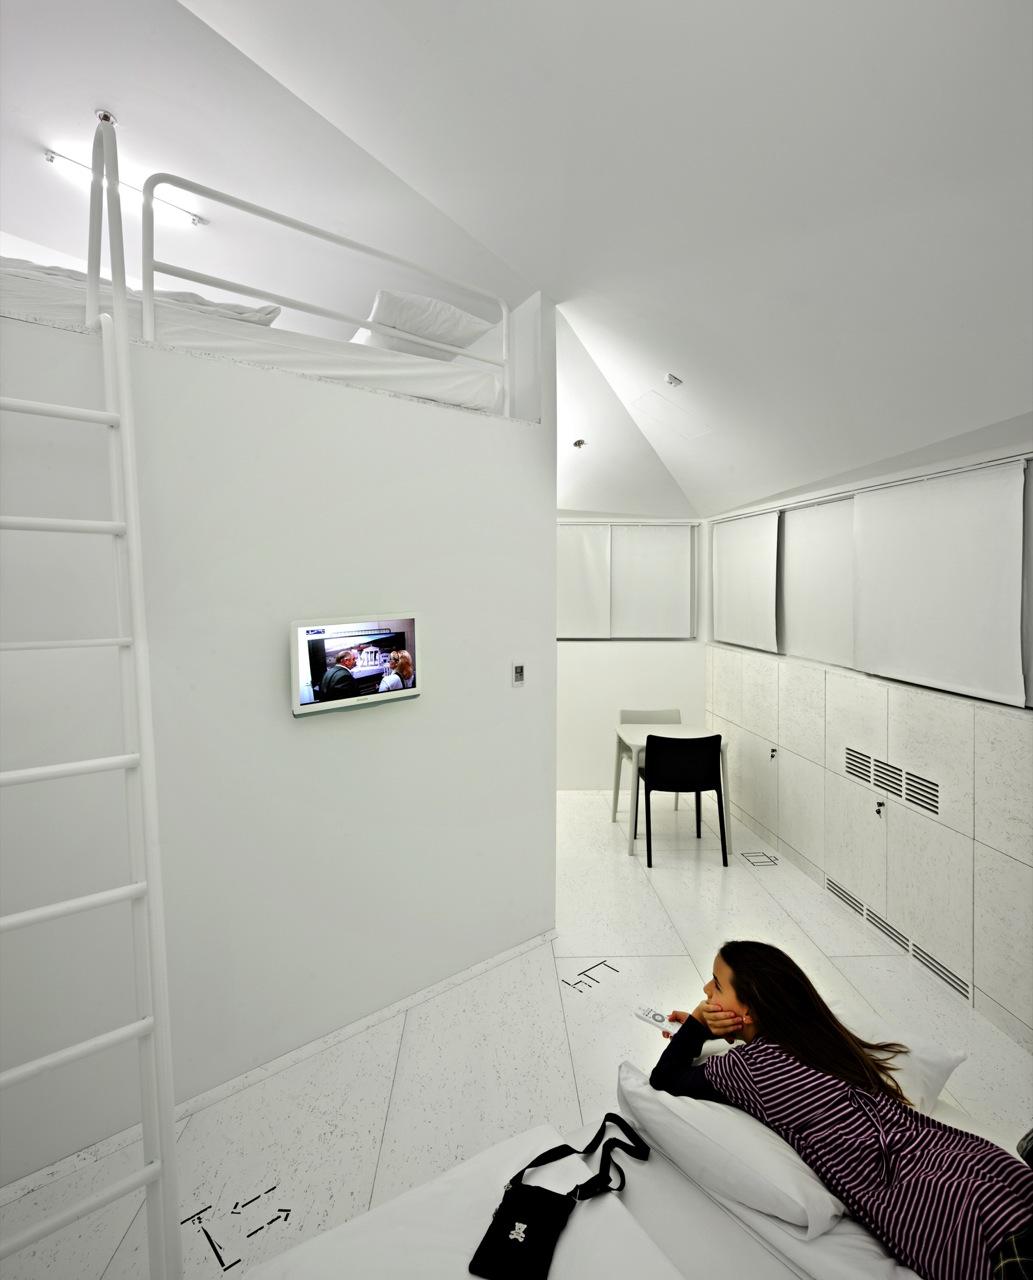 hostel golly bossy by studio up 26 Hostel Golly±Bossy By Studio Up